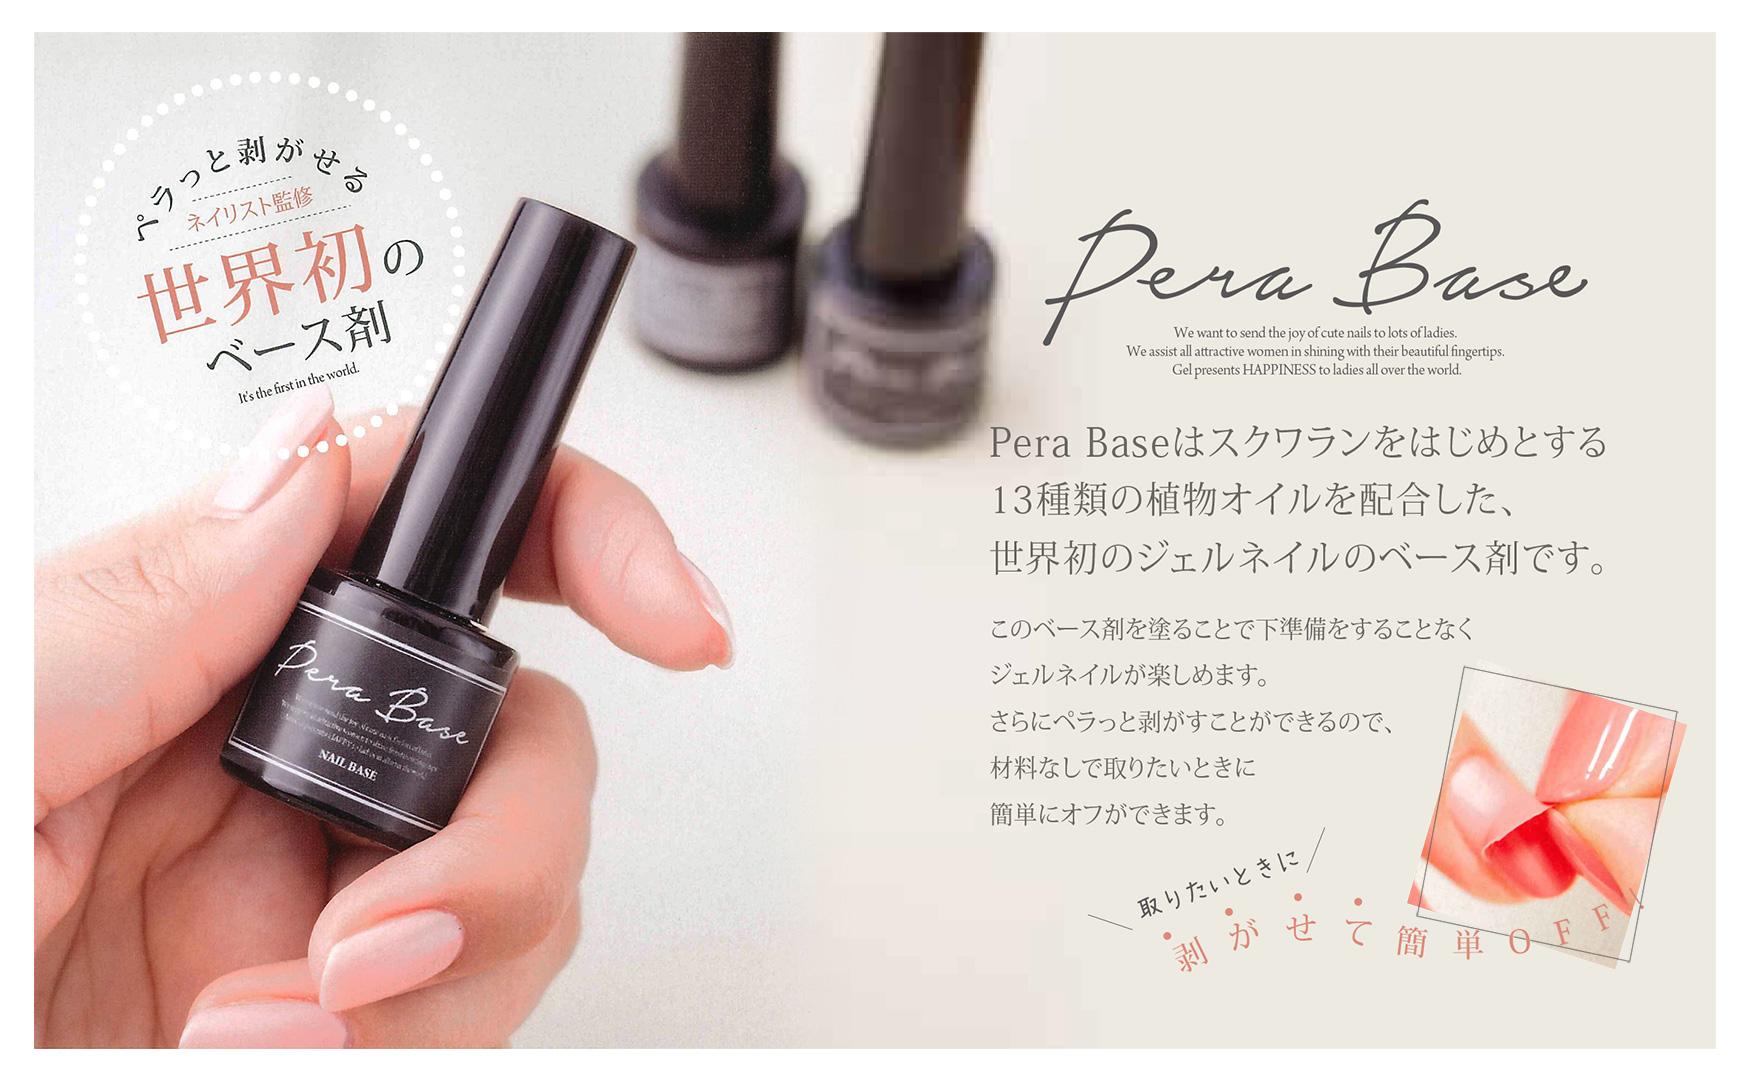 Pera Base(ペラベース)・取扱説明書(page1)